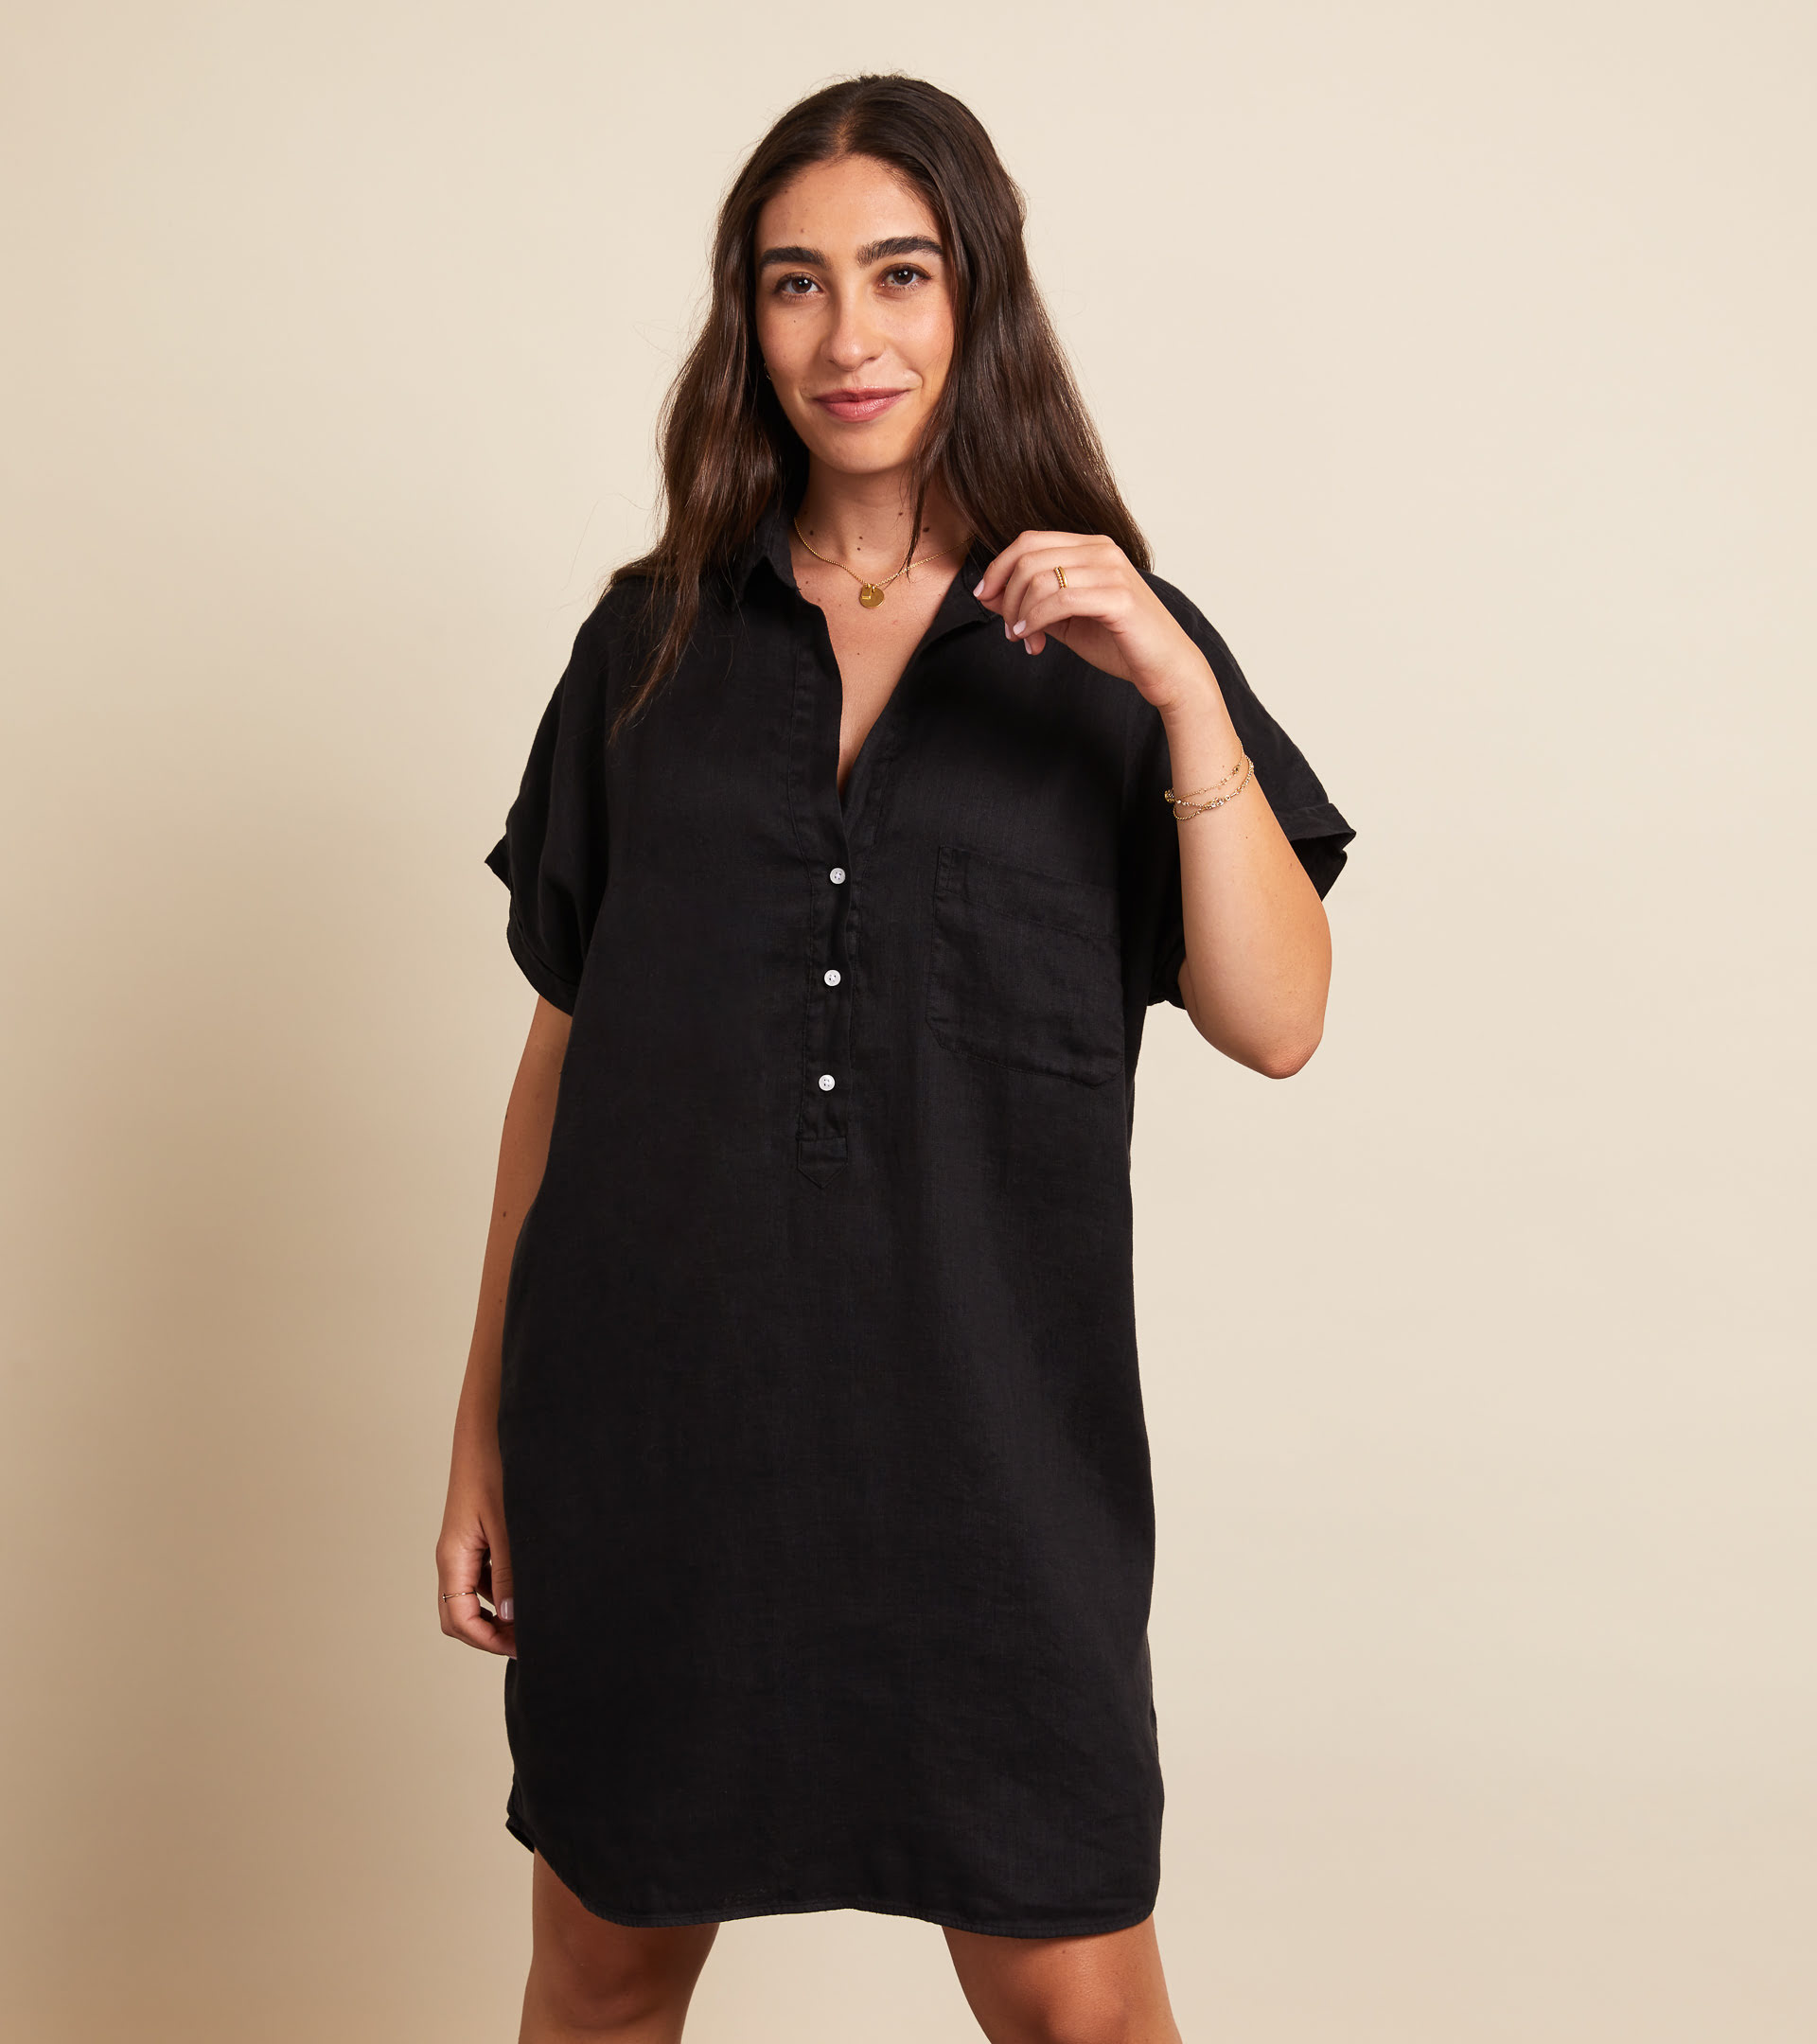 The Artist Short Sleeve Dress Black, Tumbled Linen Final Sale view 1